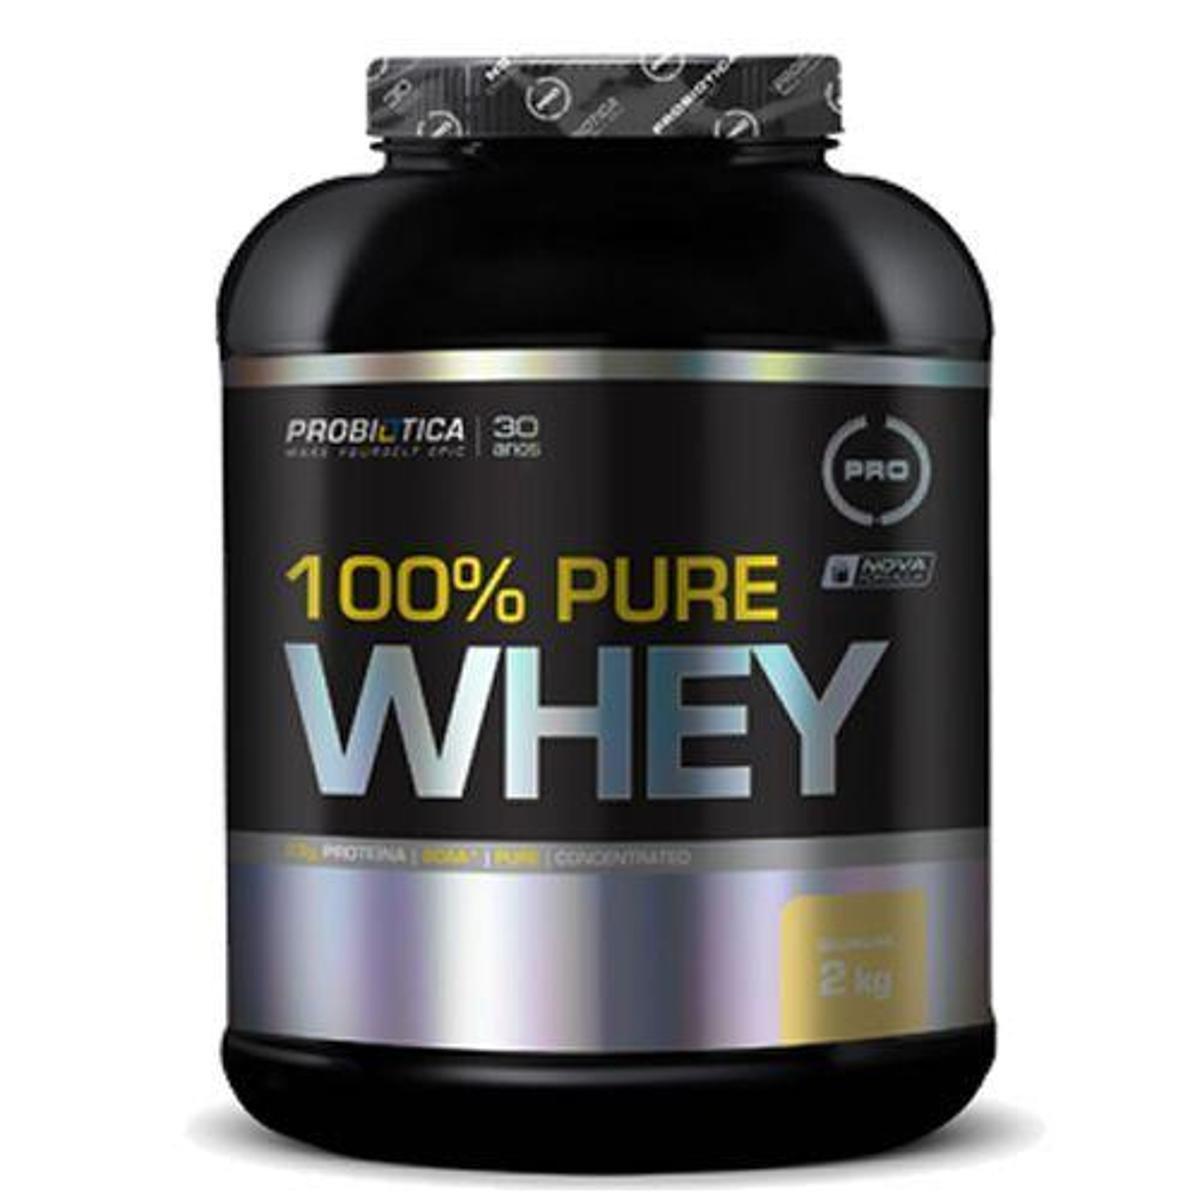 Kit 10X 100% Pure Whey - 2000g - Probiotica